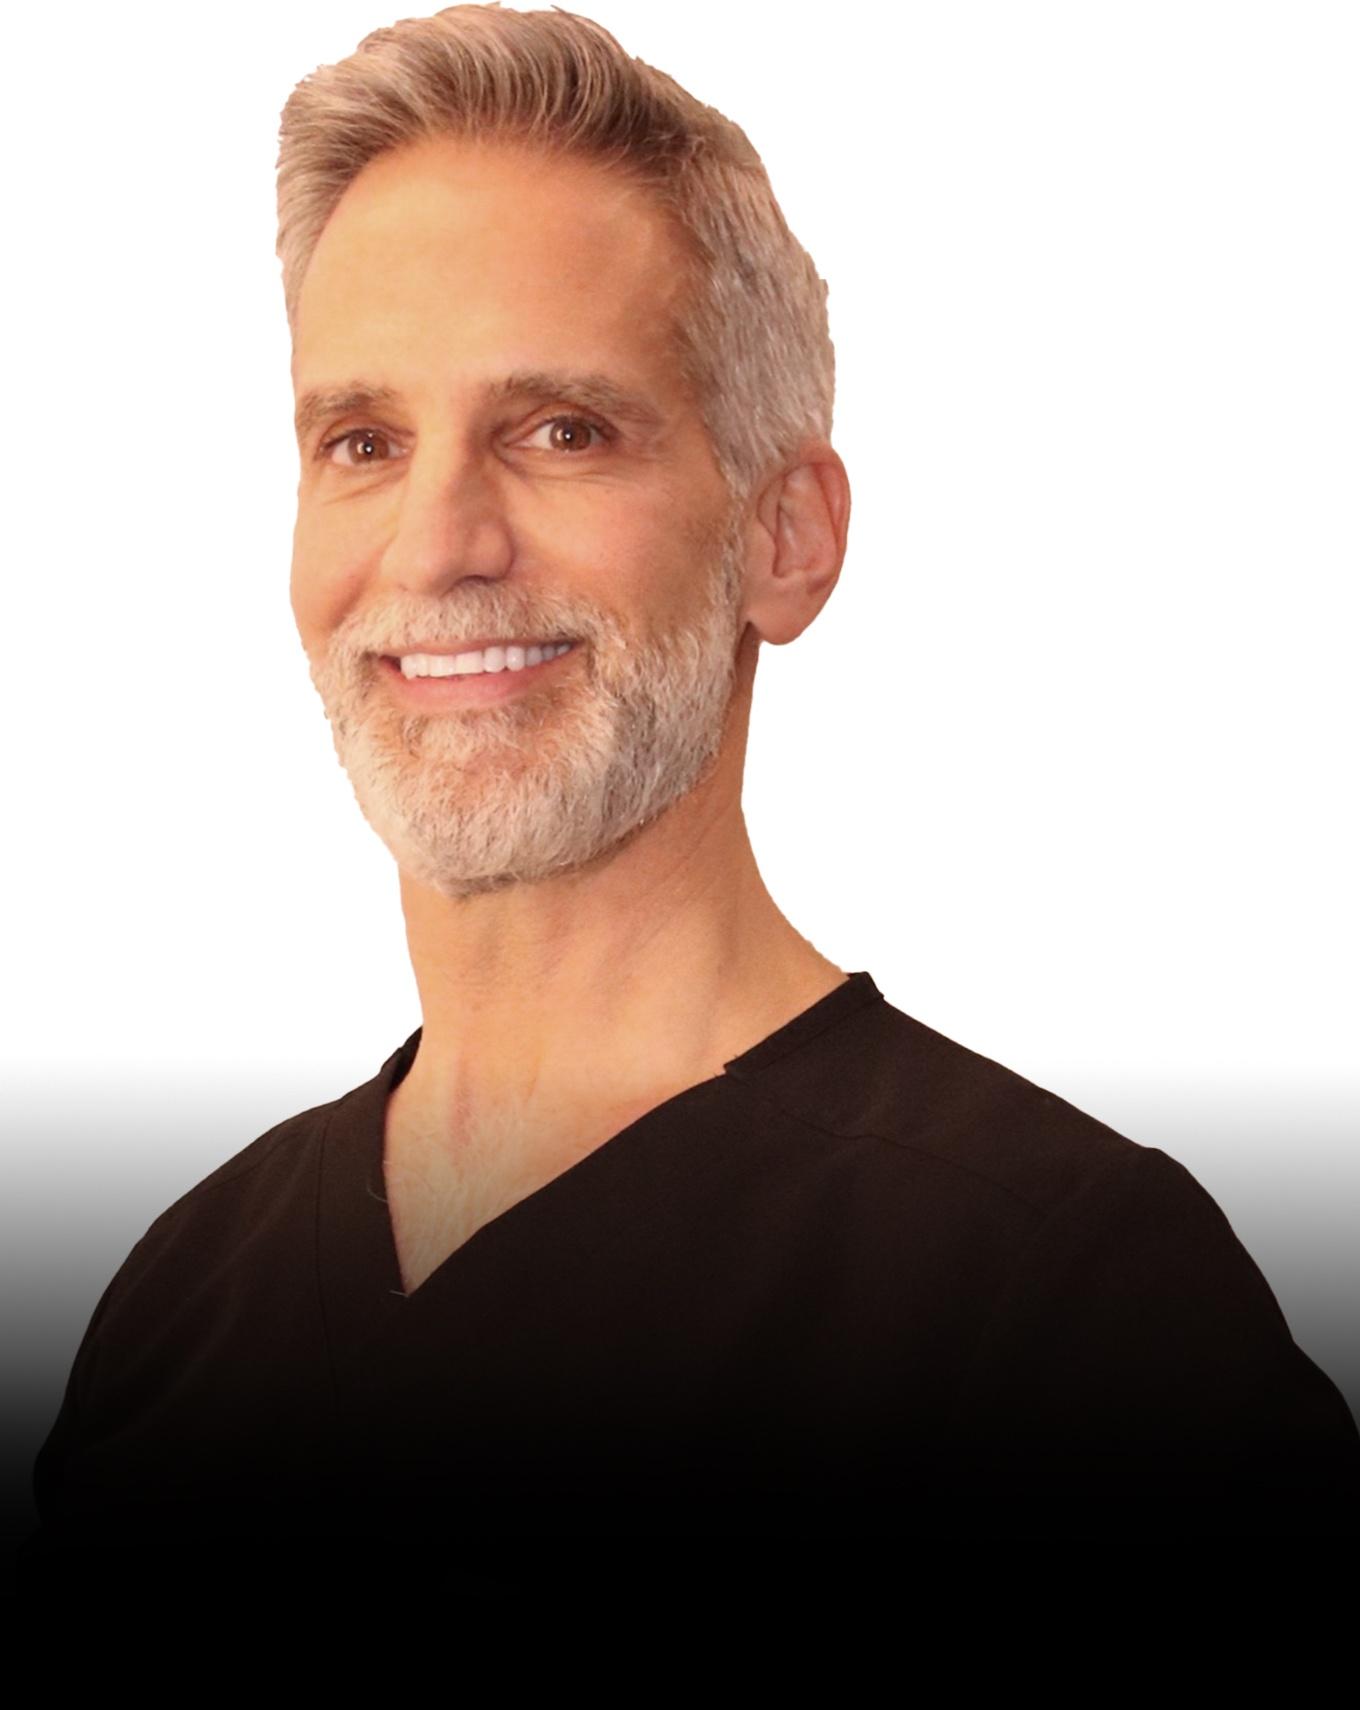 Dr. Faucher Expert Hair Transplant Surgeon | Greenwich CT, Las Vegas NV